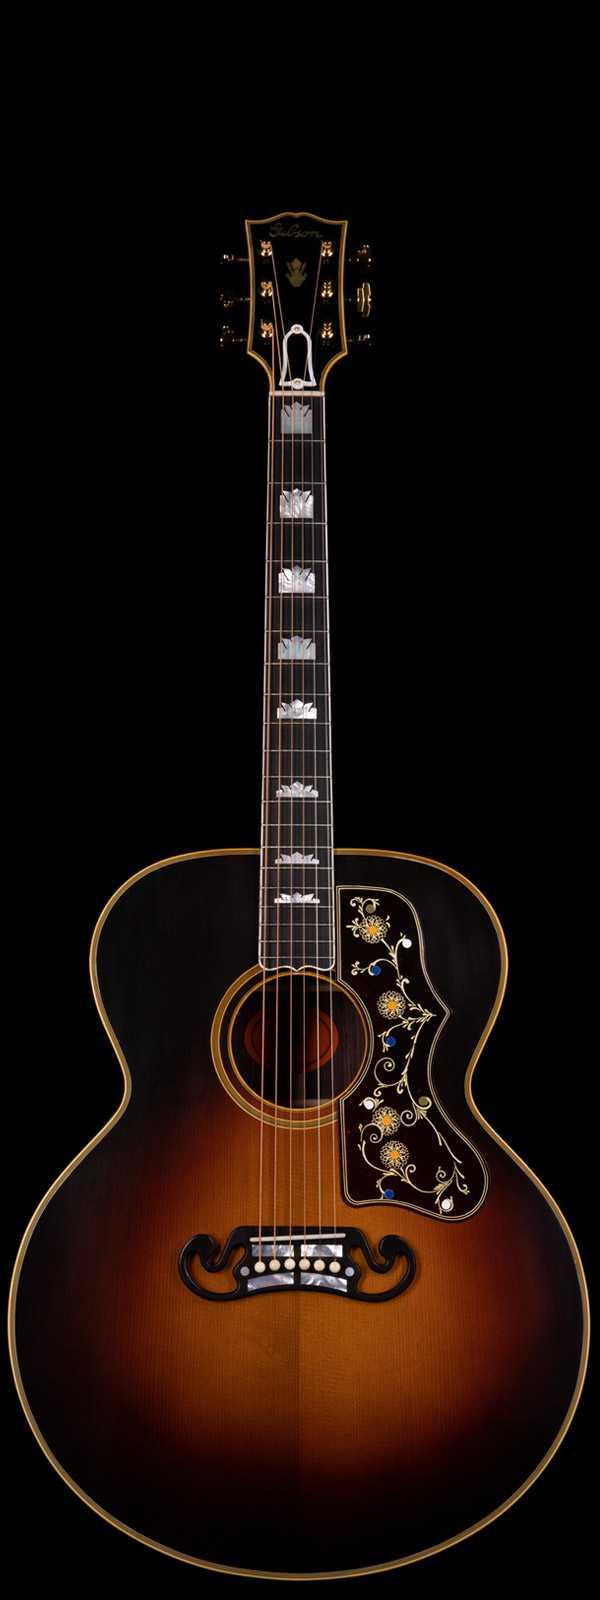 Gibson Custom Shop Pre-War SJ-200 Rosewood Thermally Aged Red Spruce Vintage Sunburst